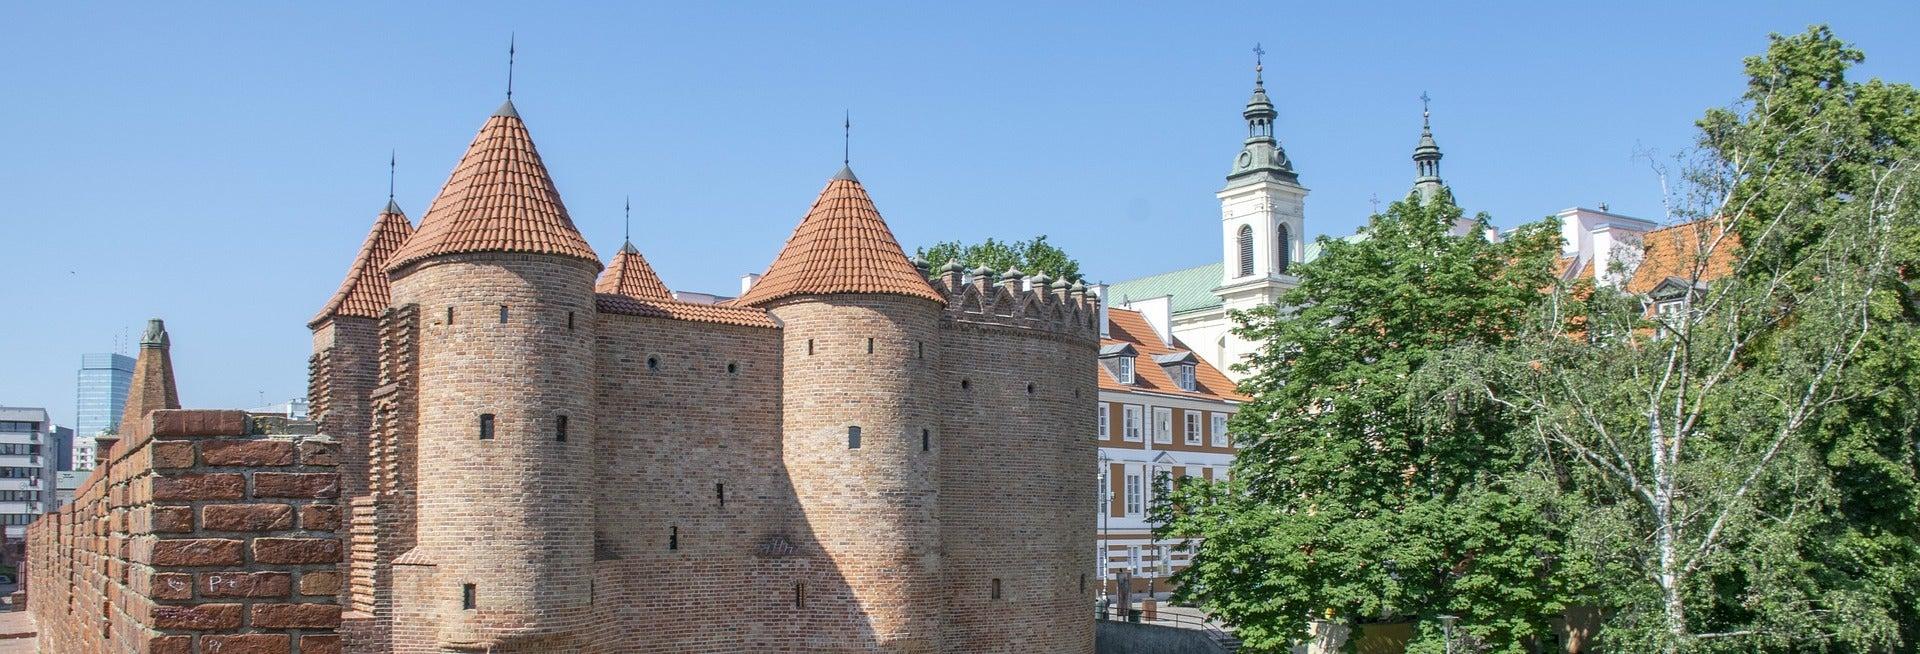 Excursión a Varsovia